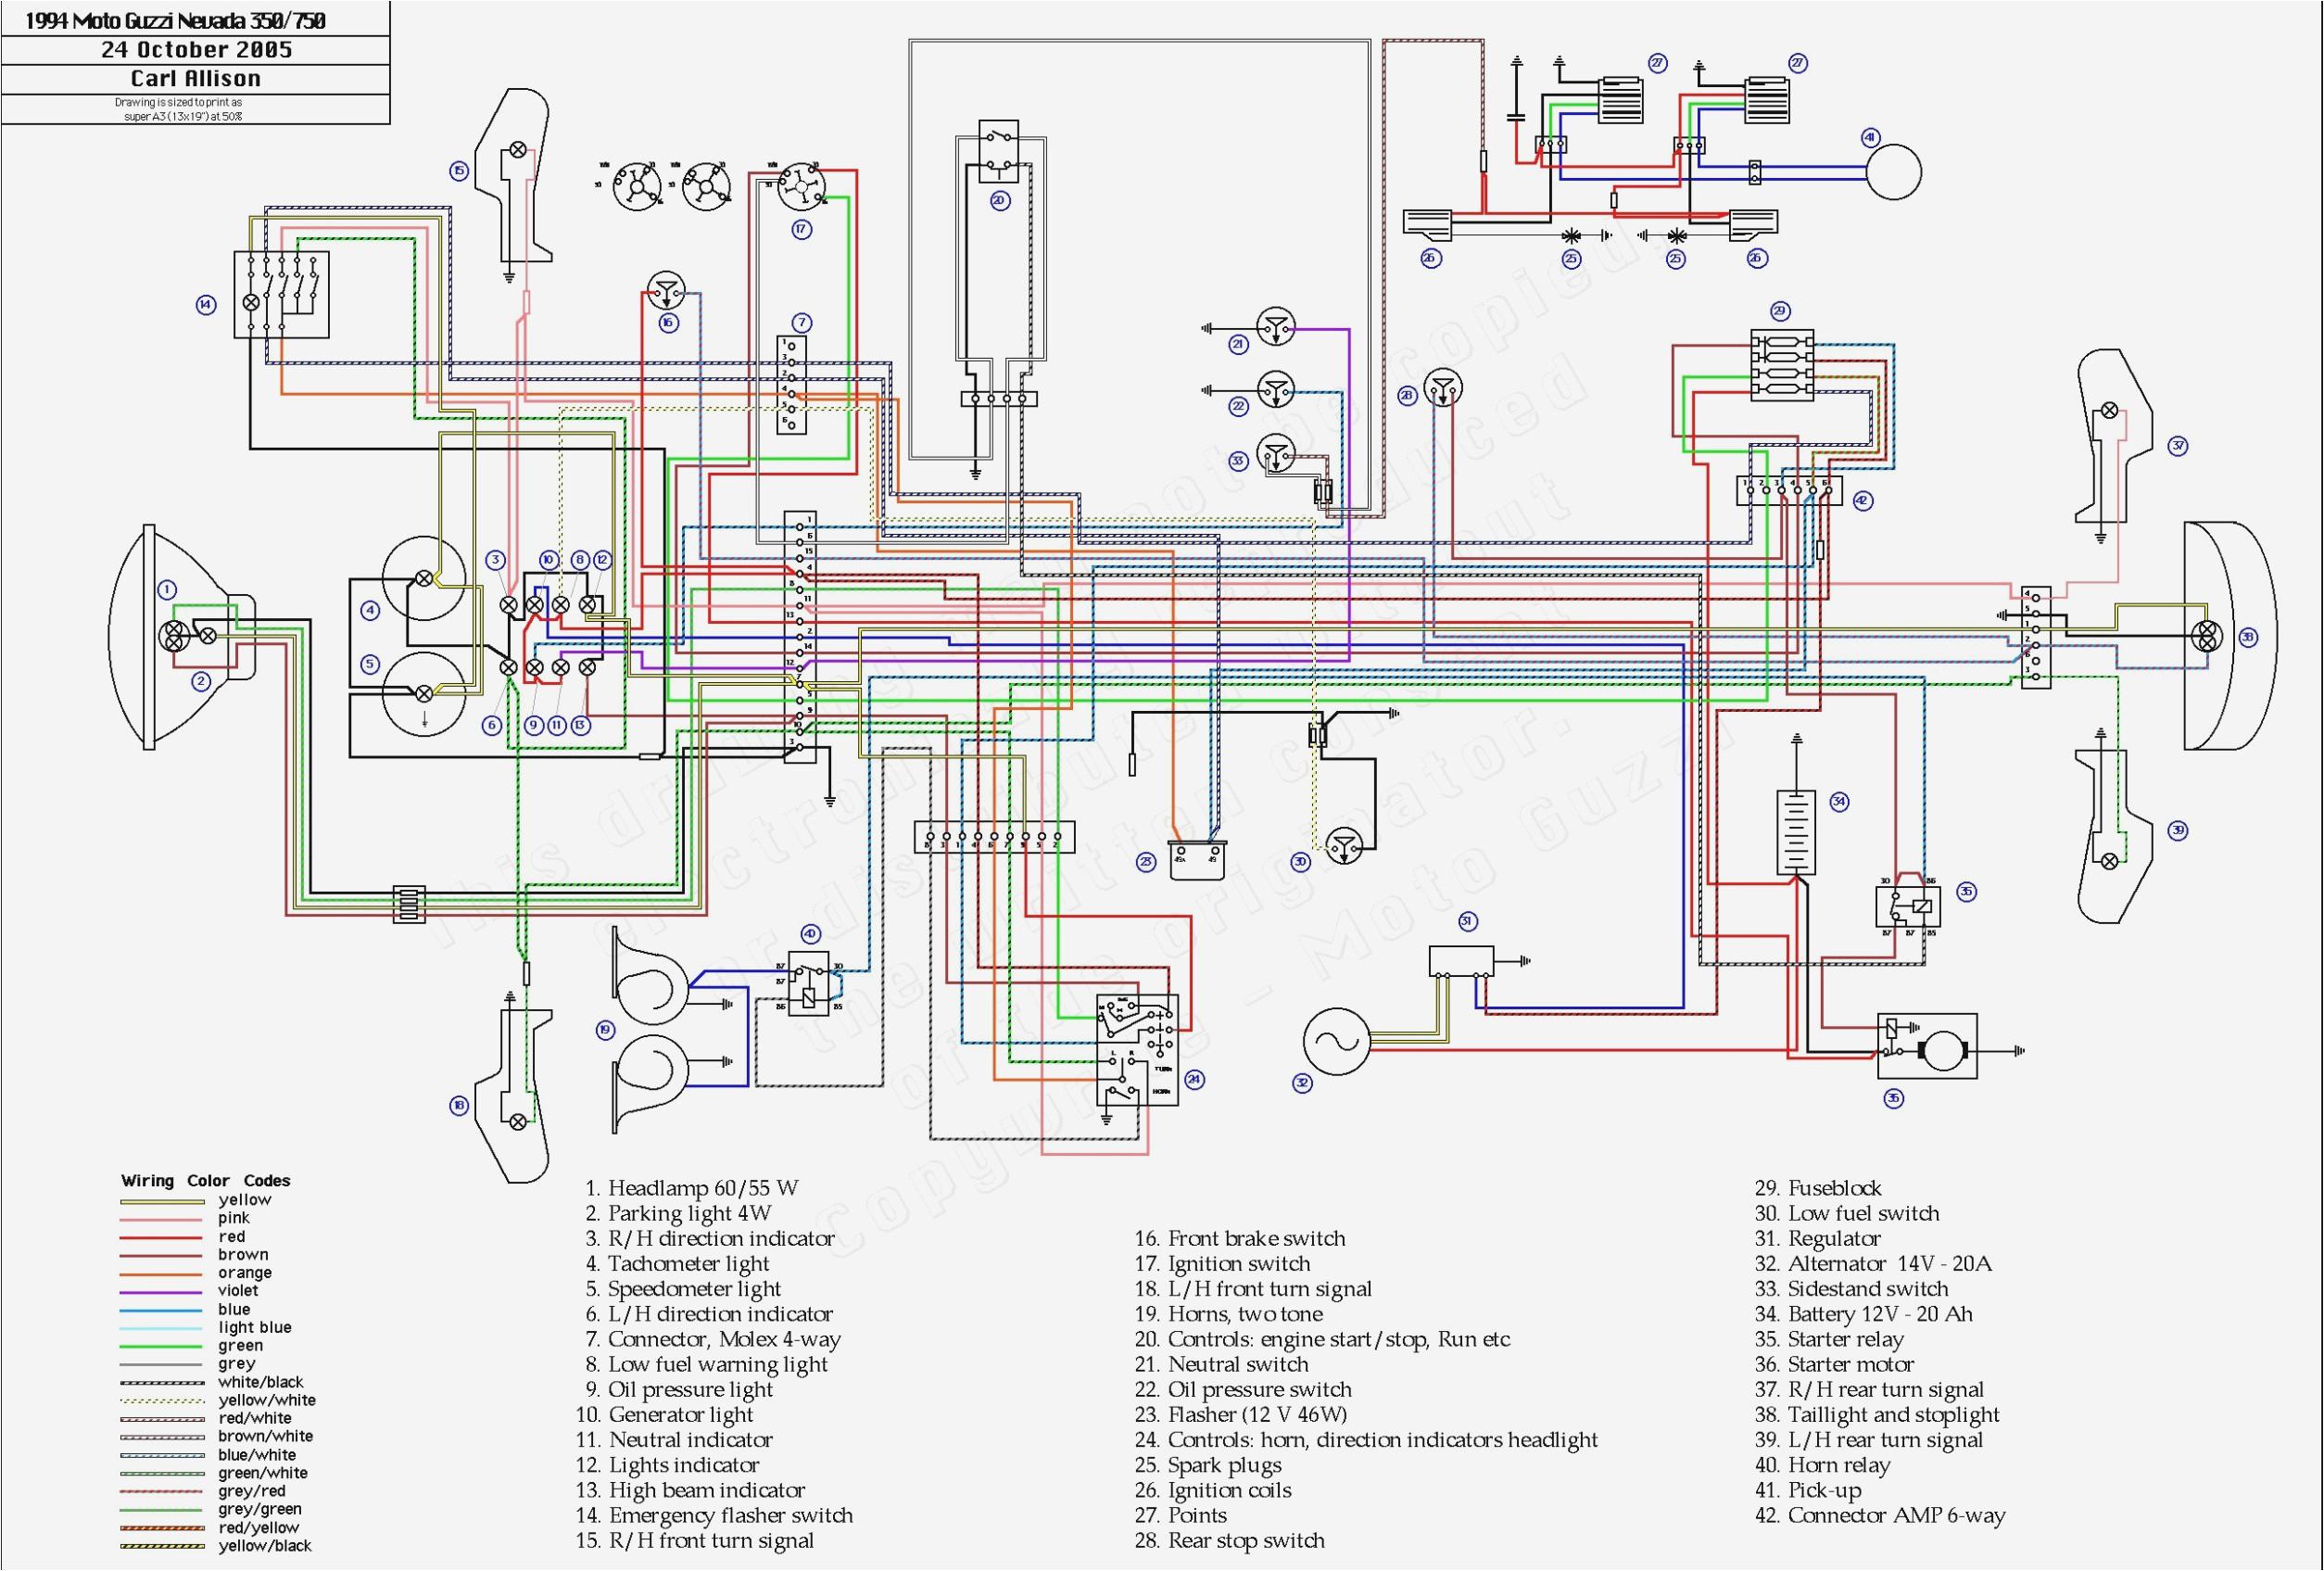 Yamaha Outboard Gauges Wiring Diagram Yamaha Marine Outboard Wiring Diagram Wiring Diagram Centre